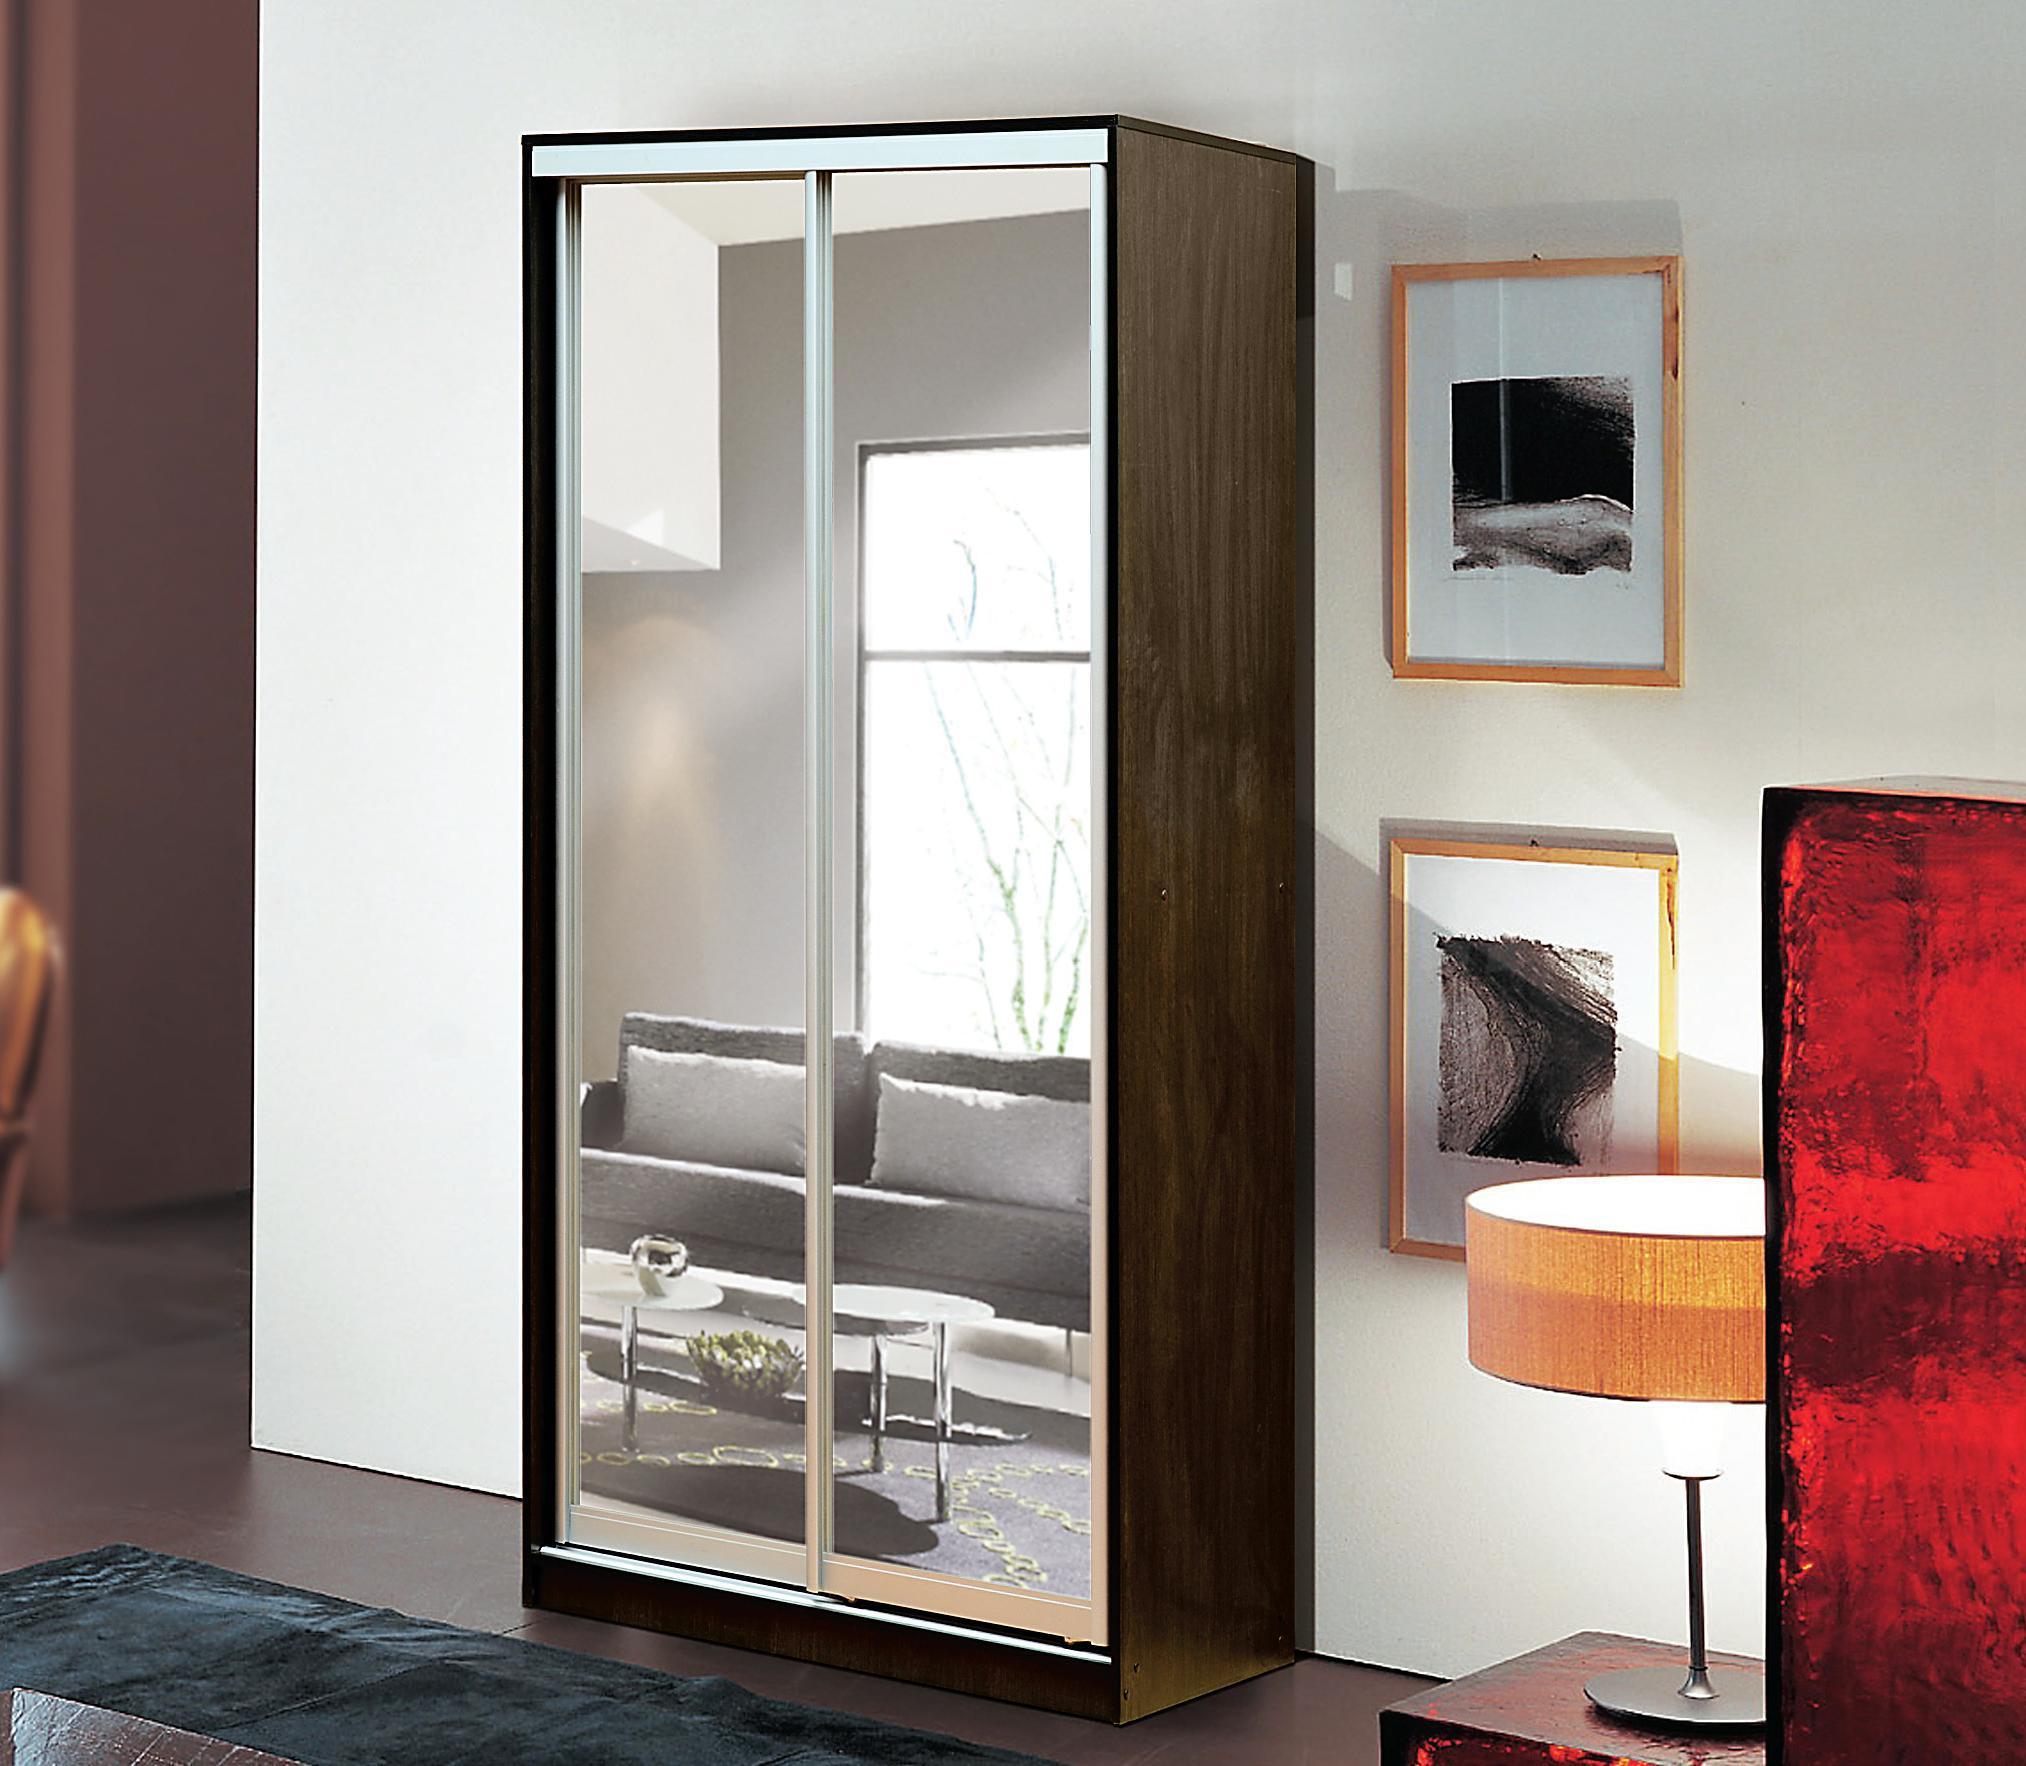 Шкаф-купе мираж 10 венге : купить шкафы-купе : амбар мебели,.